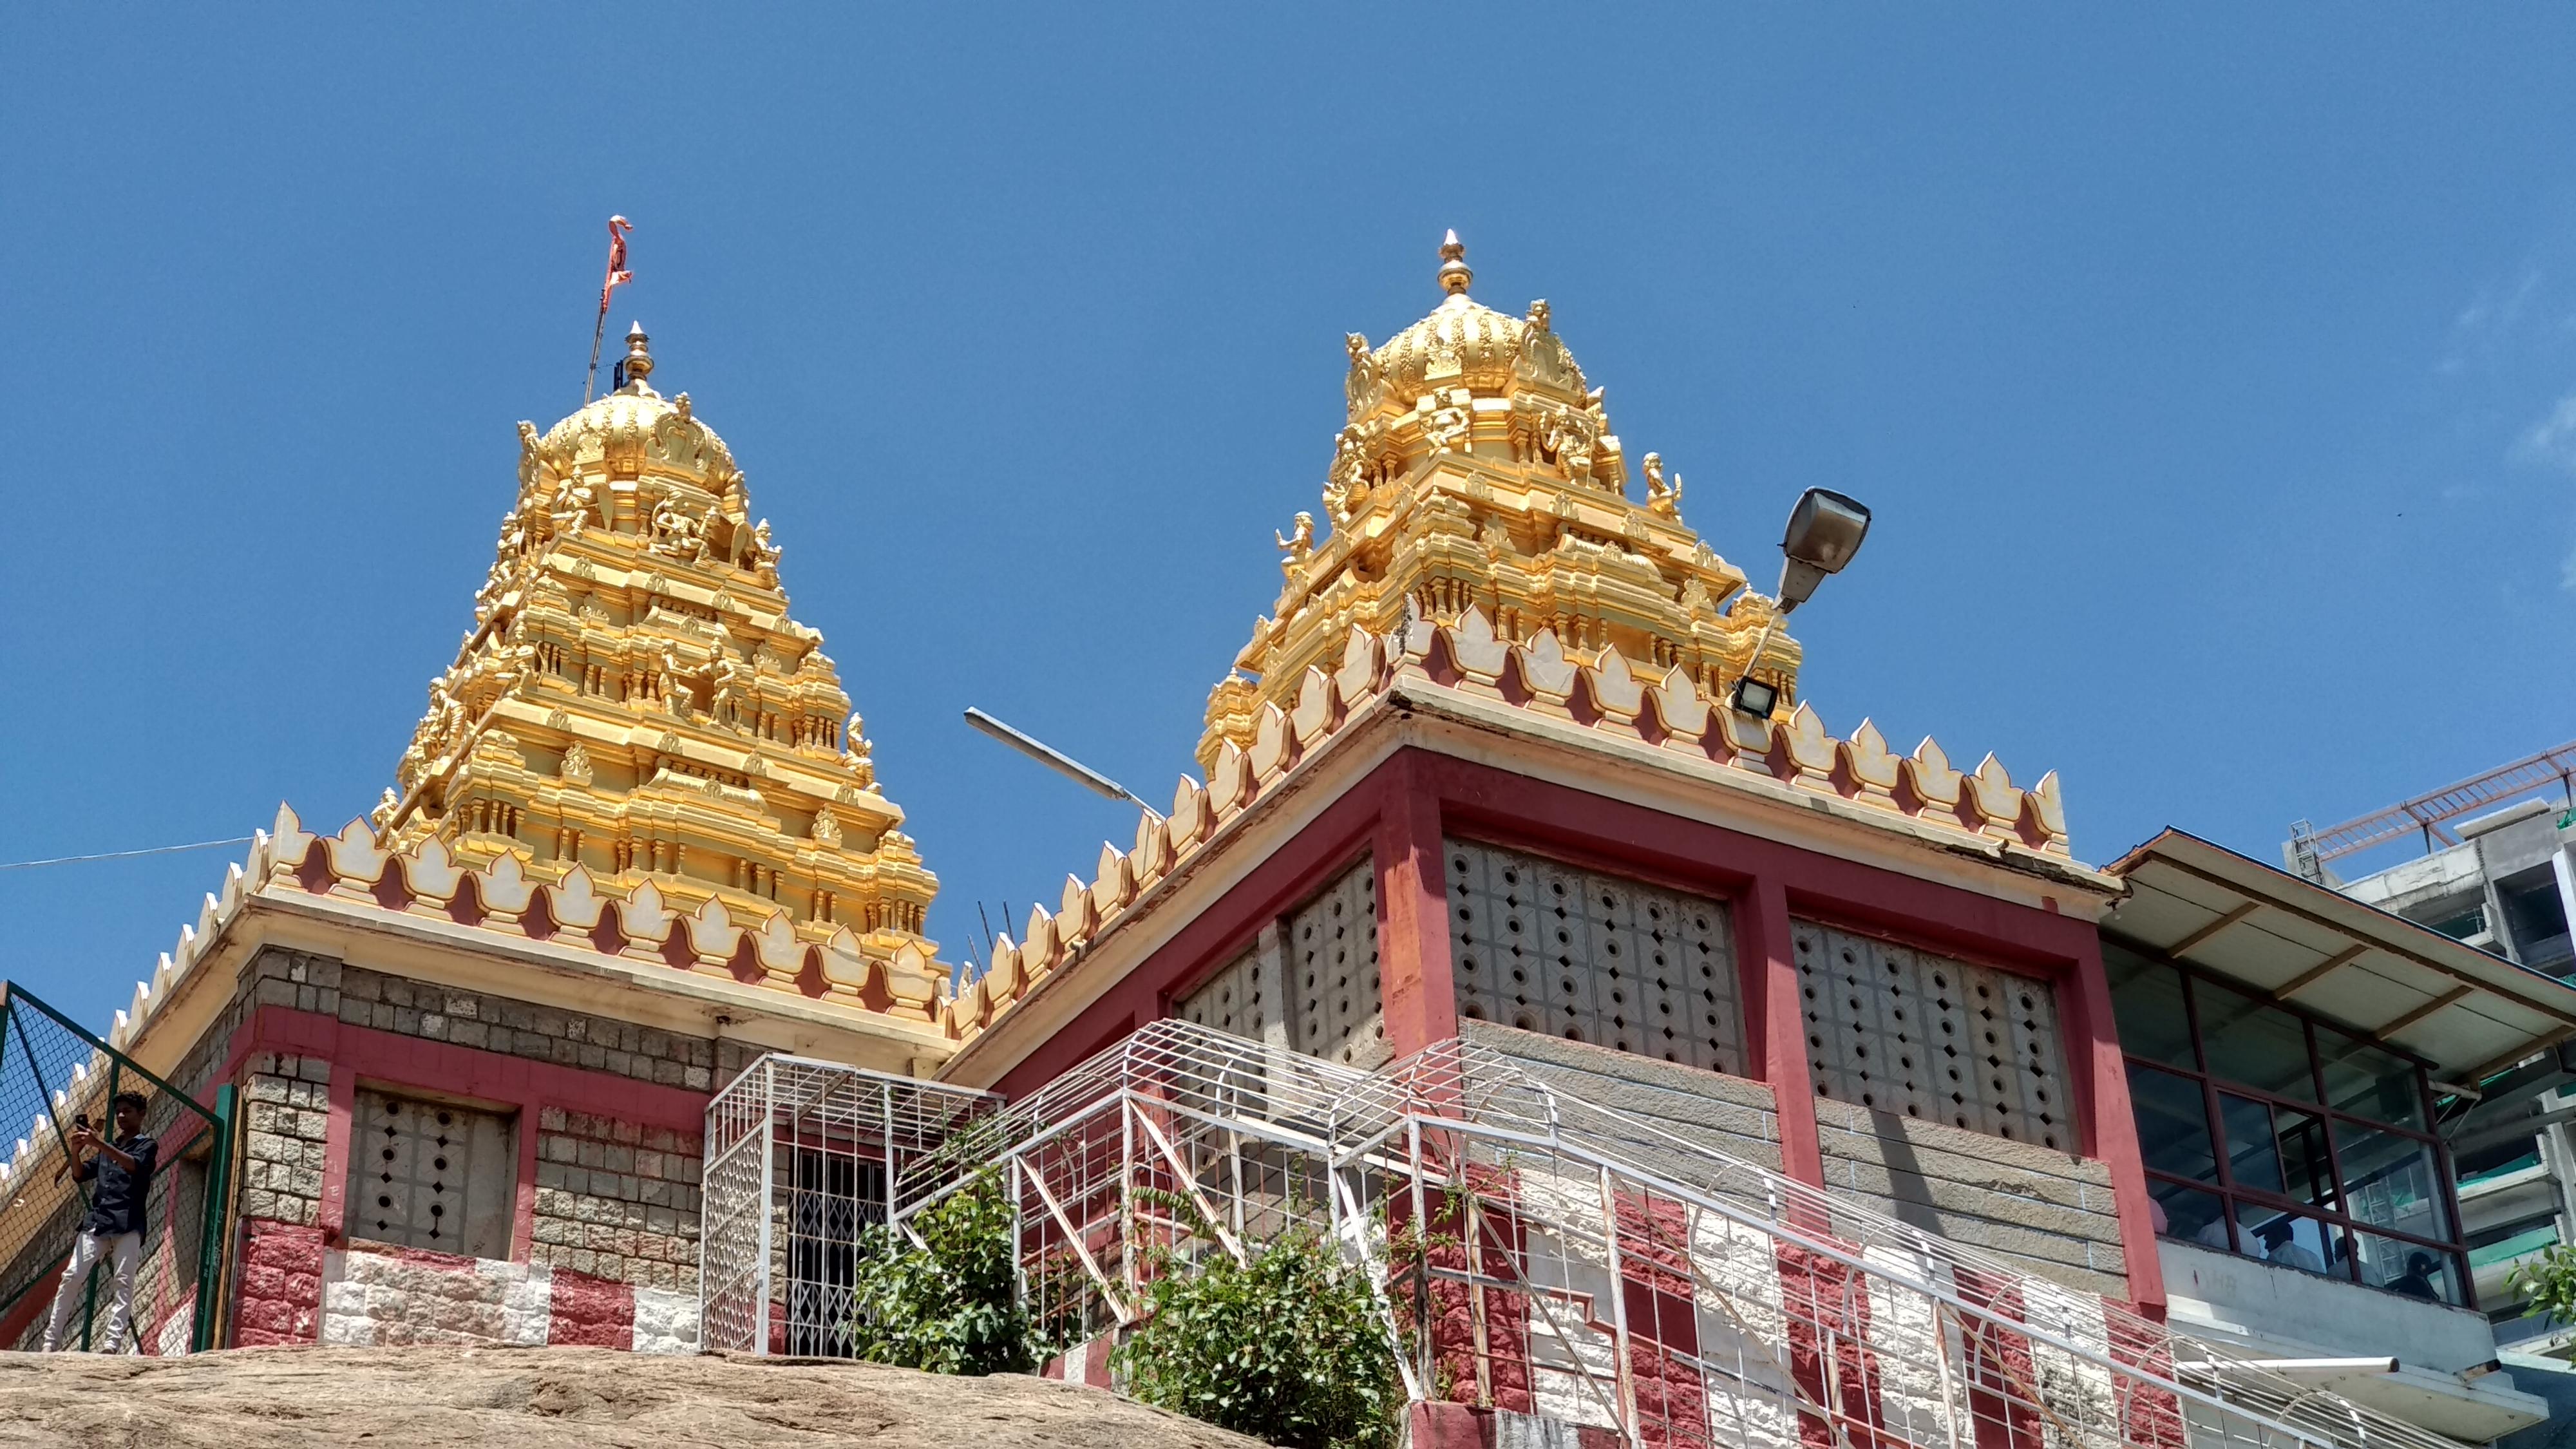 Ragiguddu Sri Prasanna Anjaneyaswamy Temple